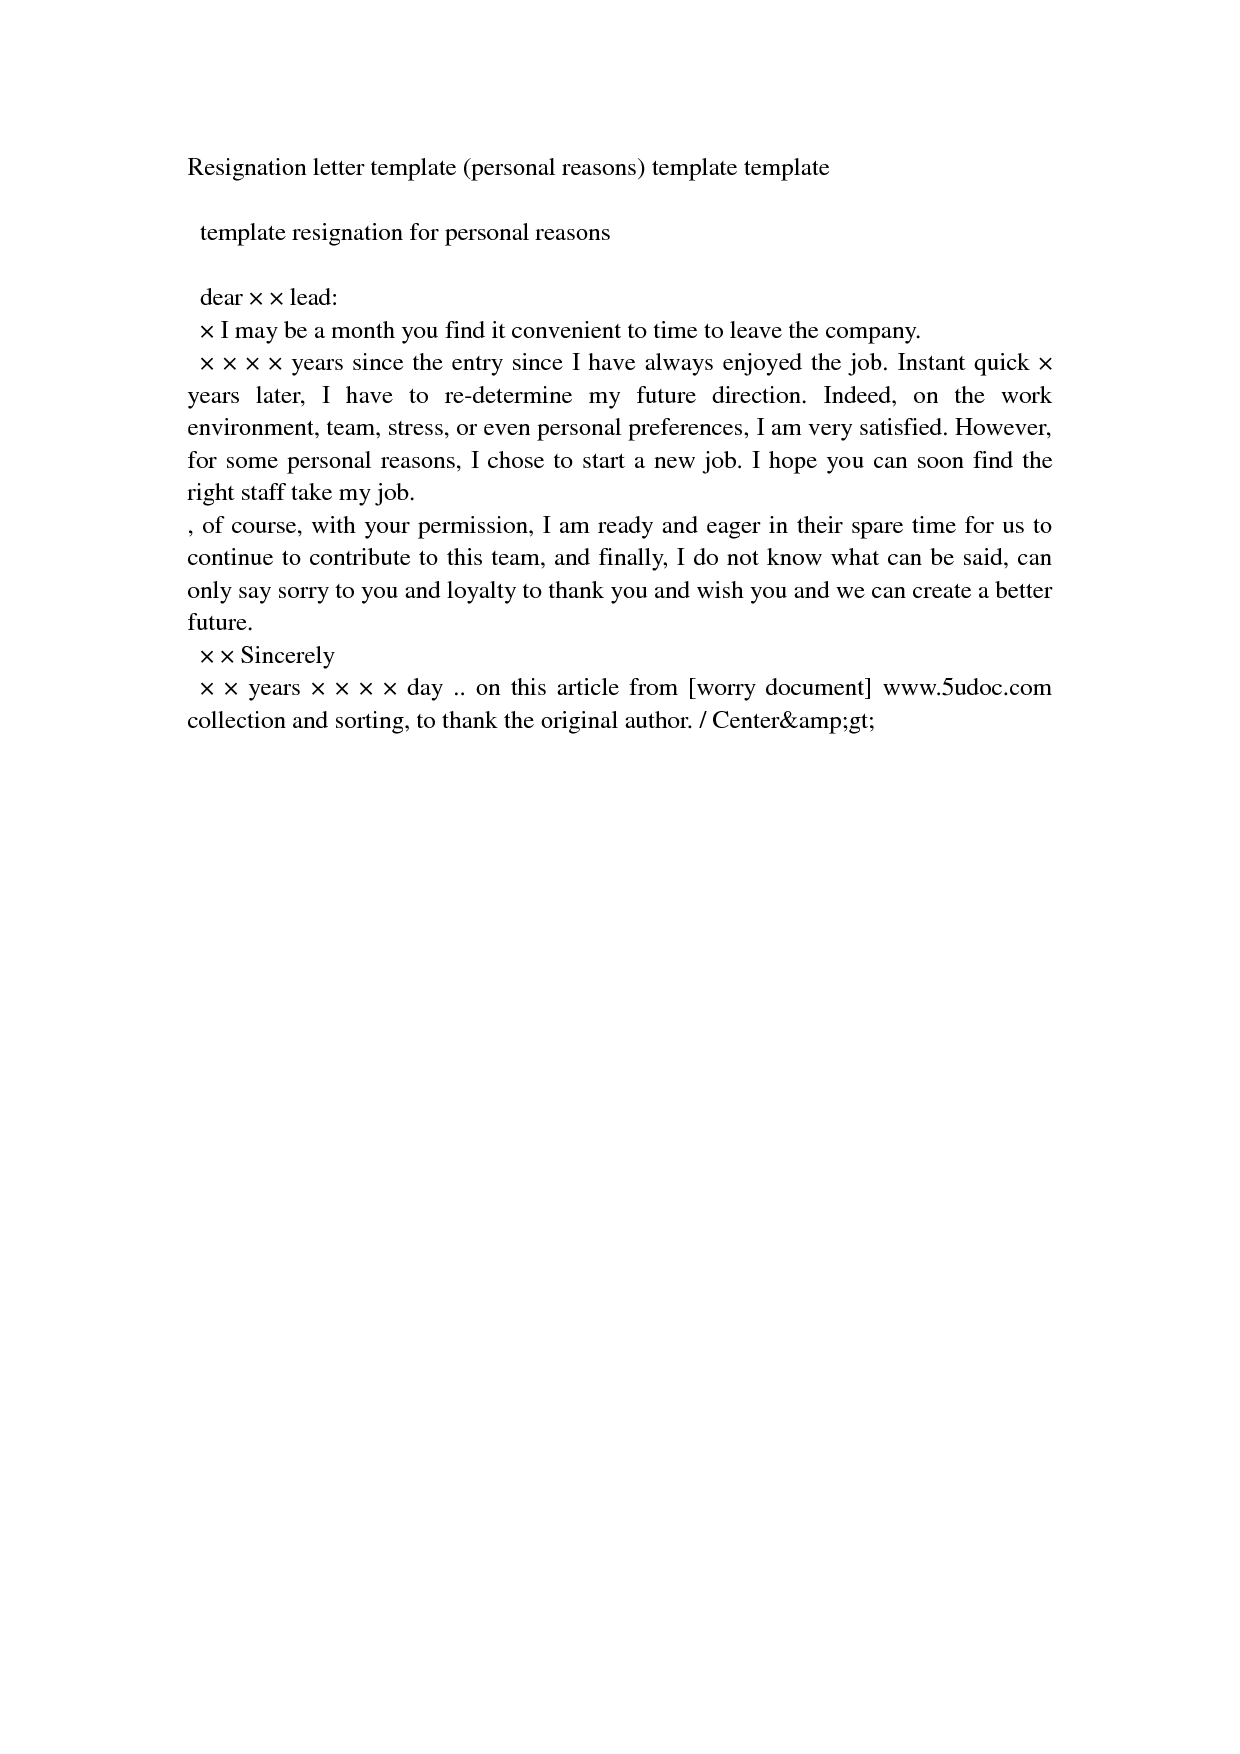 Resign Letter For PersonalWriting A Letter Of Resignation Email Letter Sample  Cover Latter